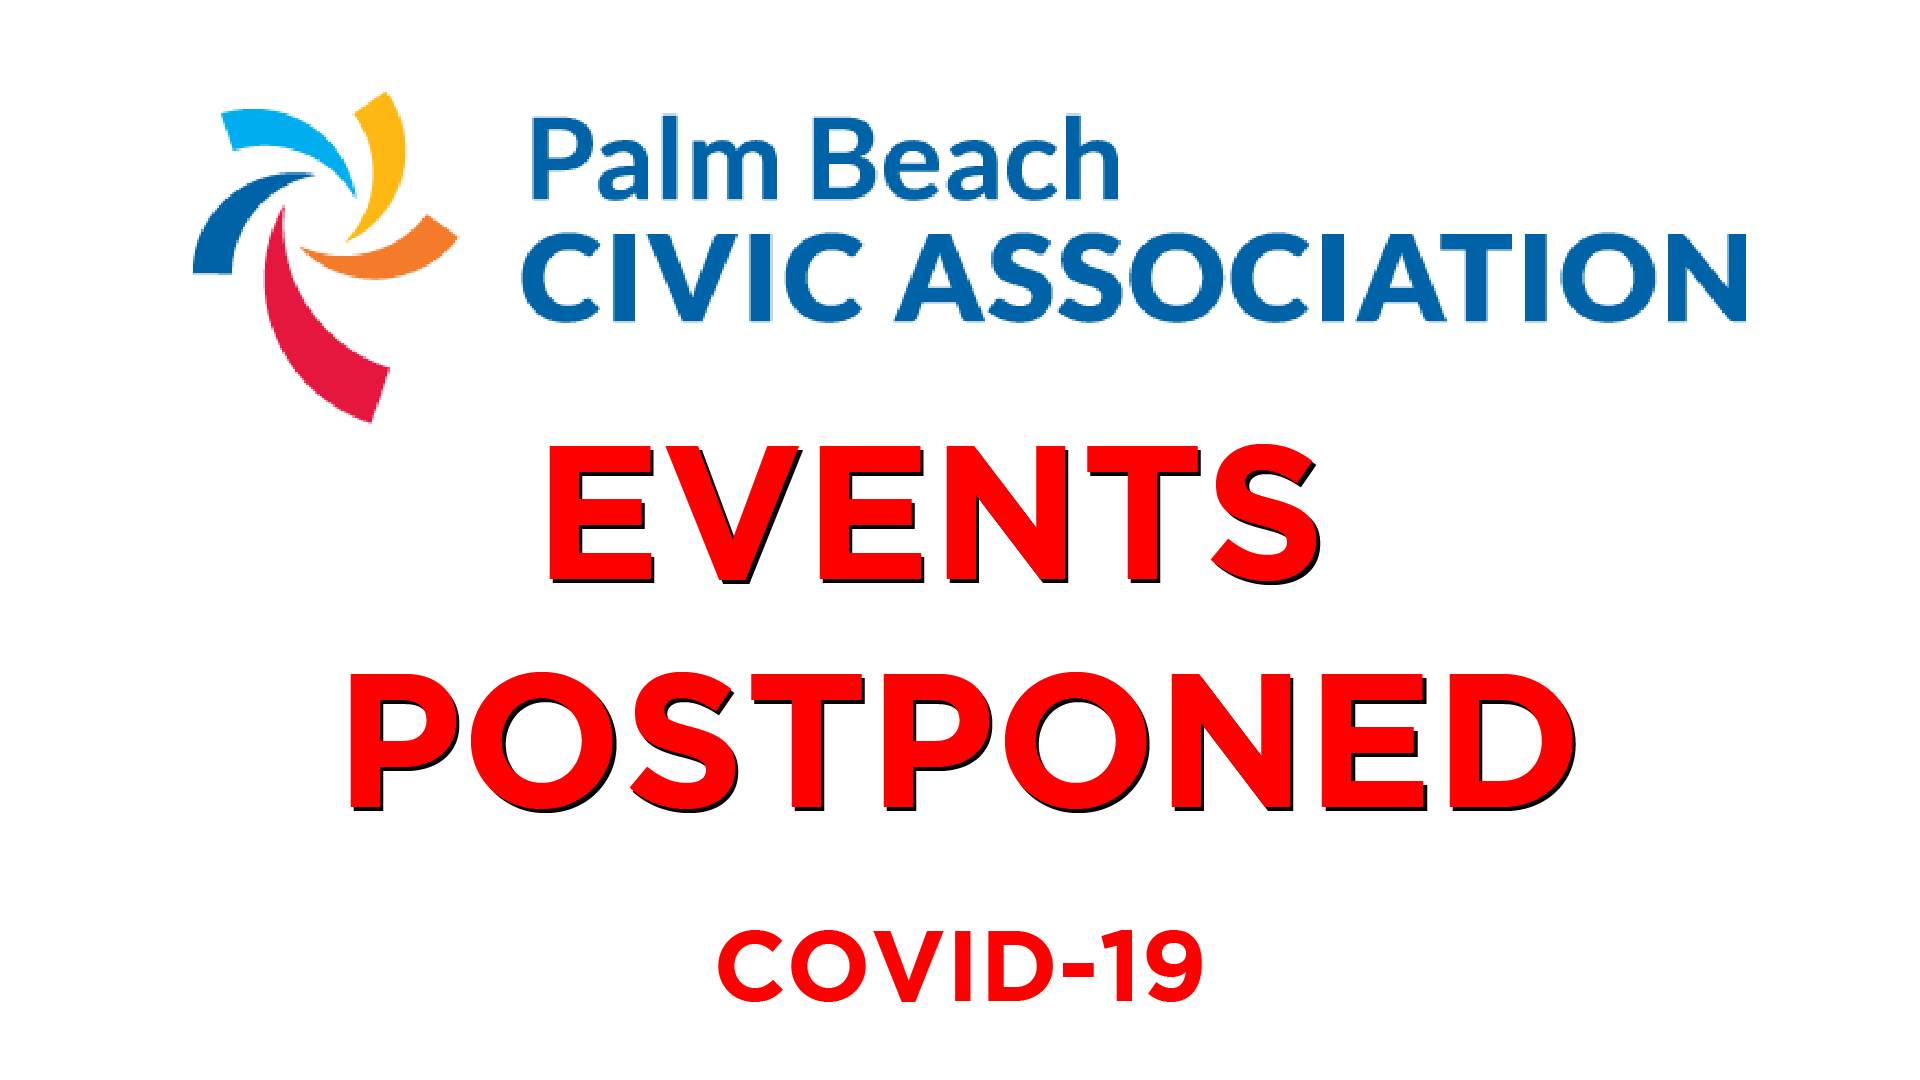 Palm Beach Civic Association Events postponed COVID-19